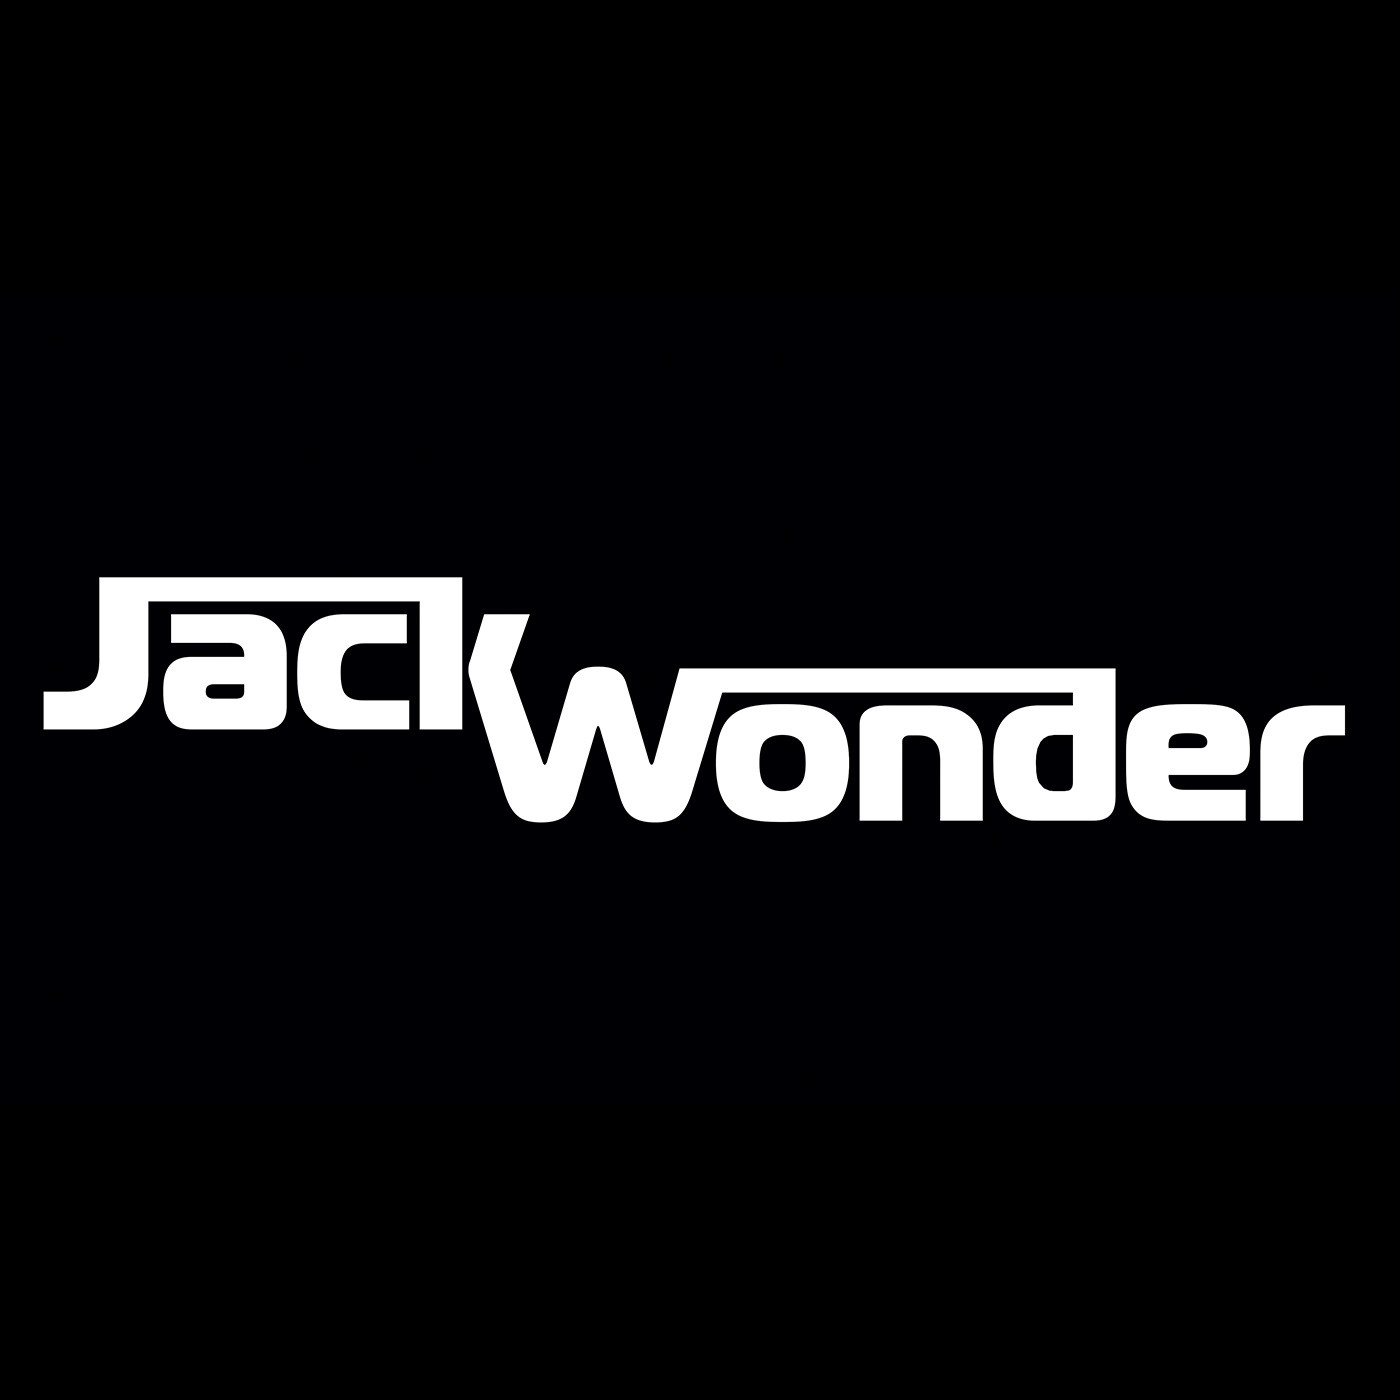 Jack Wonder